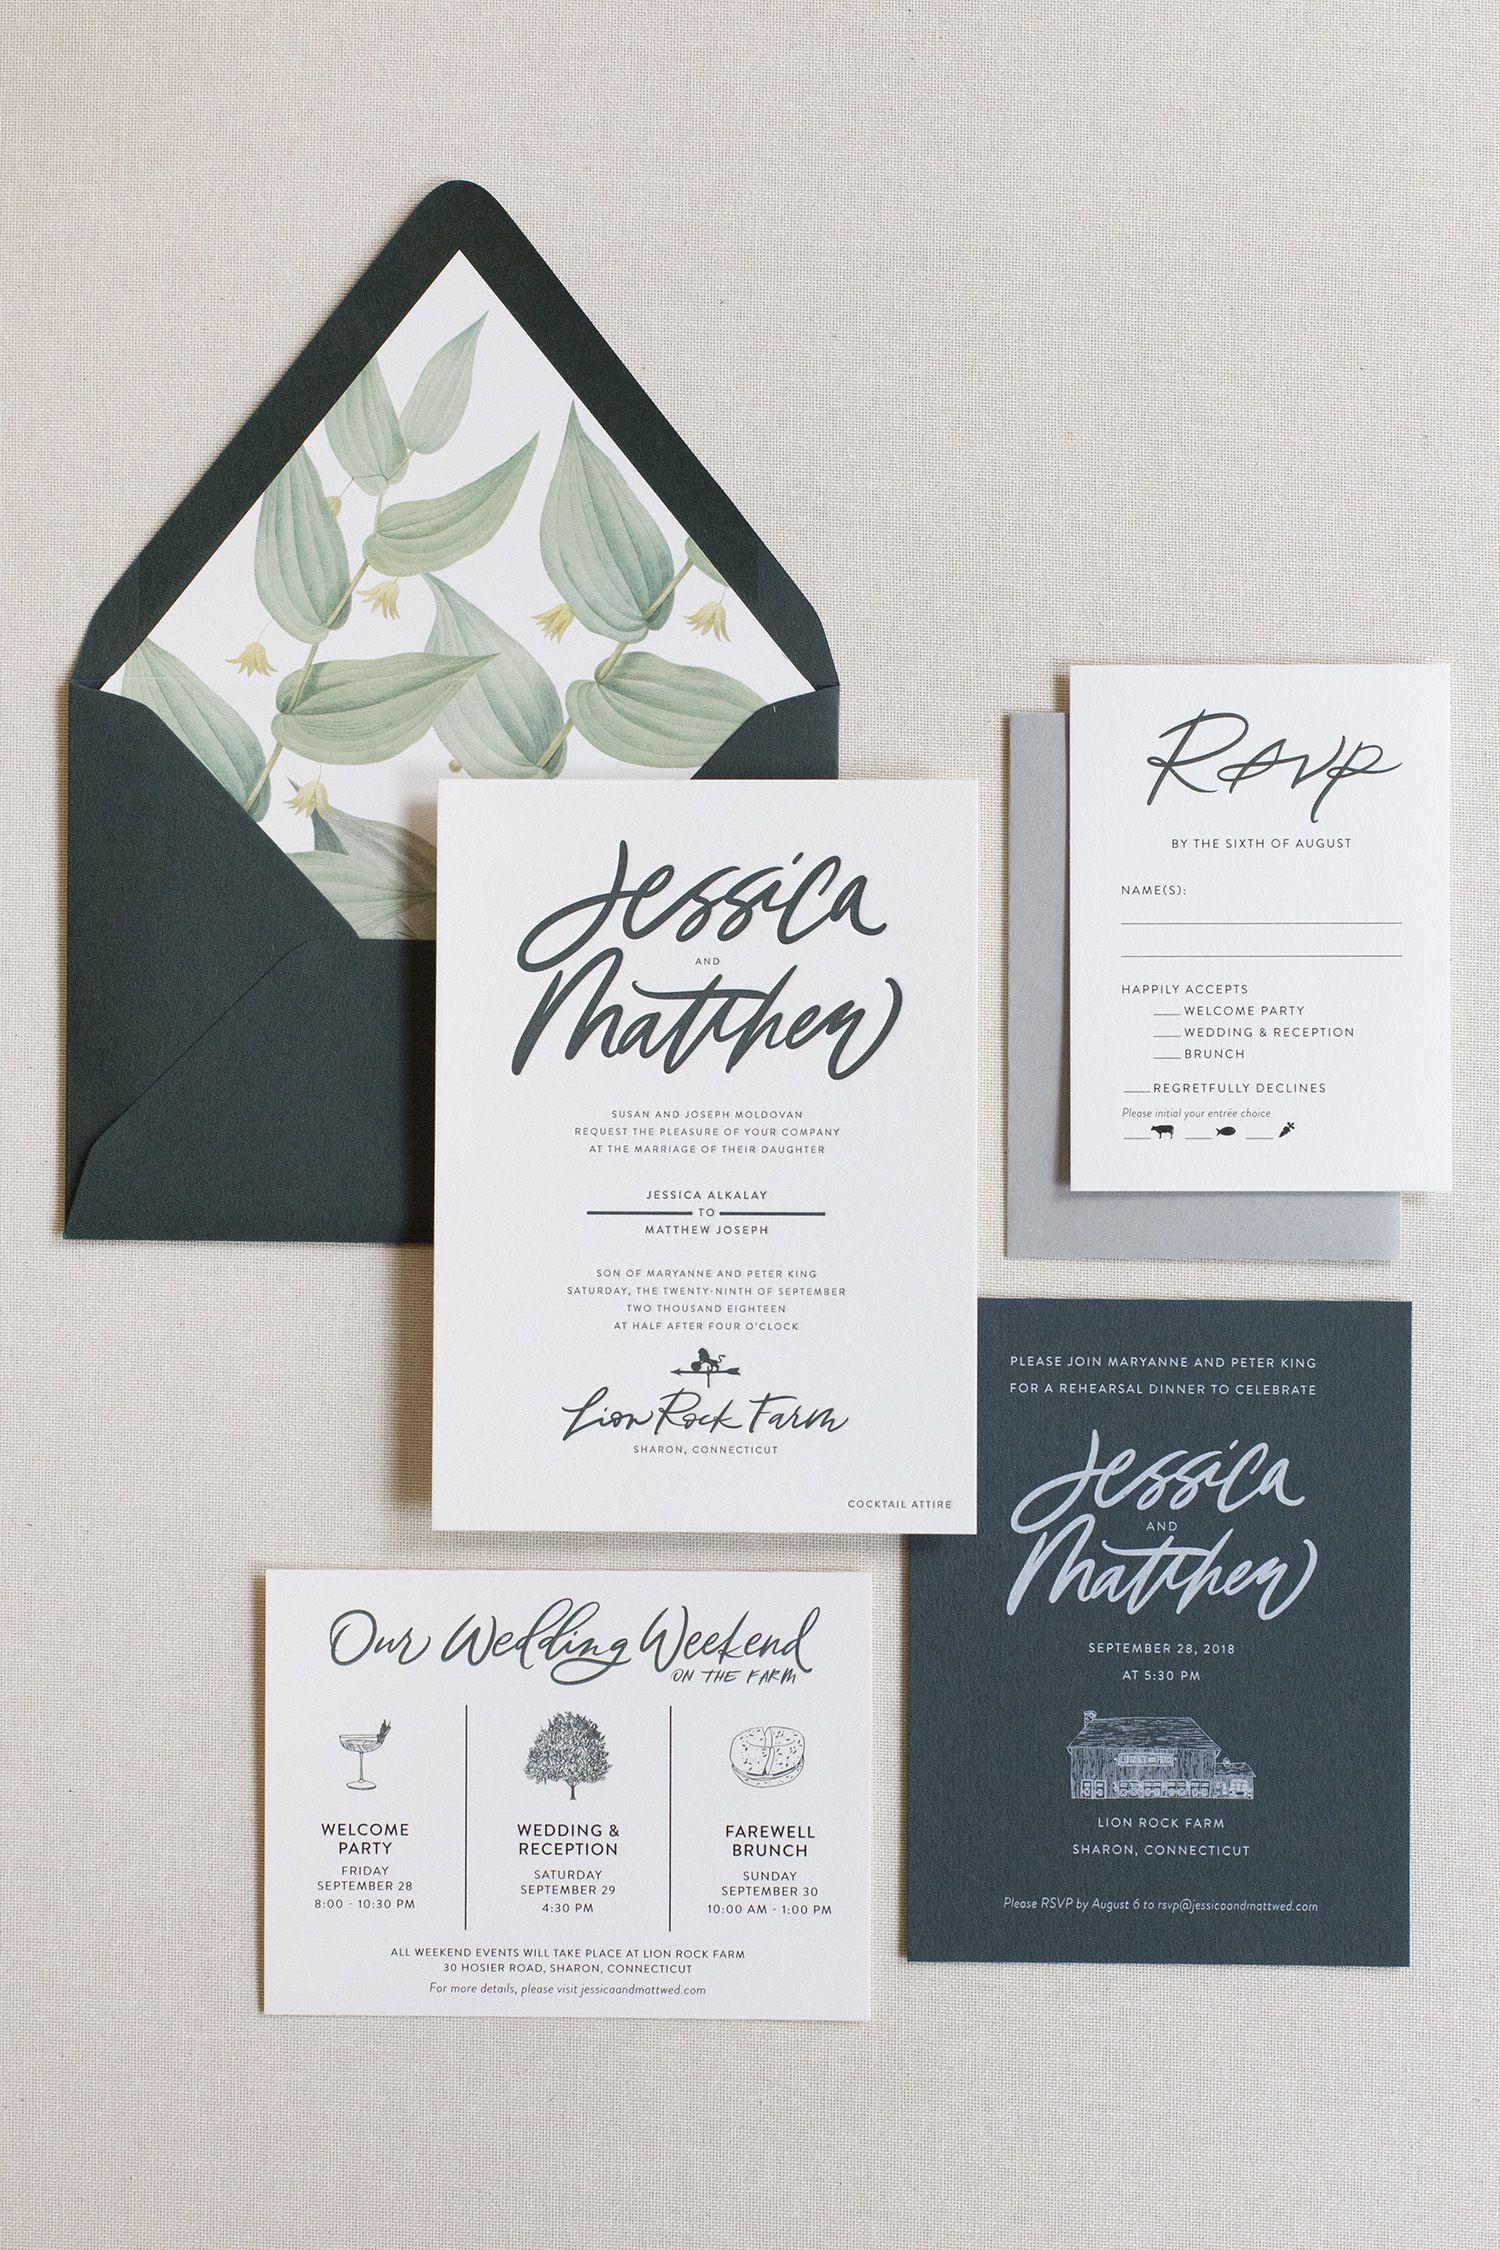 Fourteen Forty Is A Wedding Invitation Design Studio Located In New York City We Crea Create Wedding Invitations Wedding Invitation Design Wedding Invitations